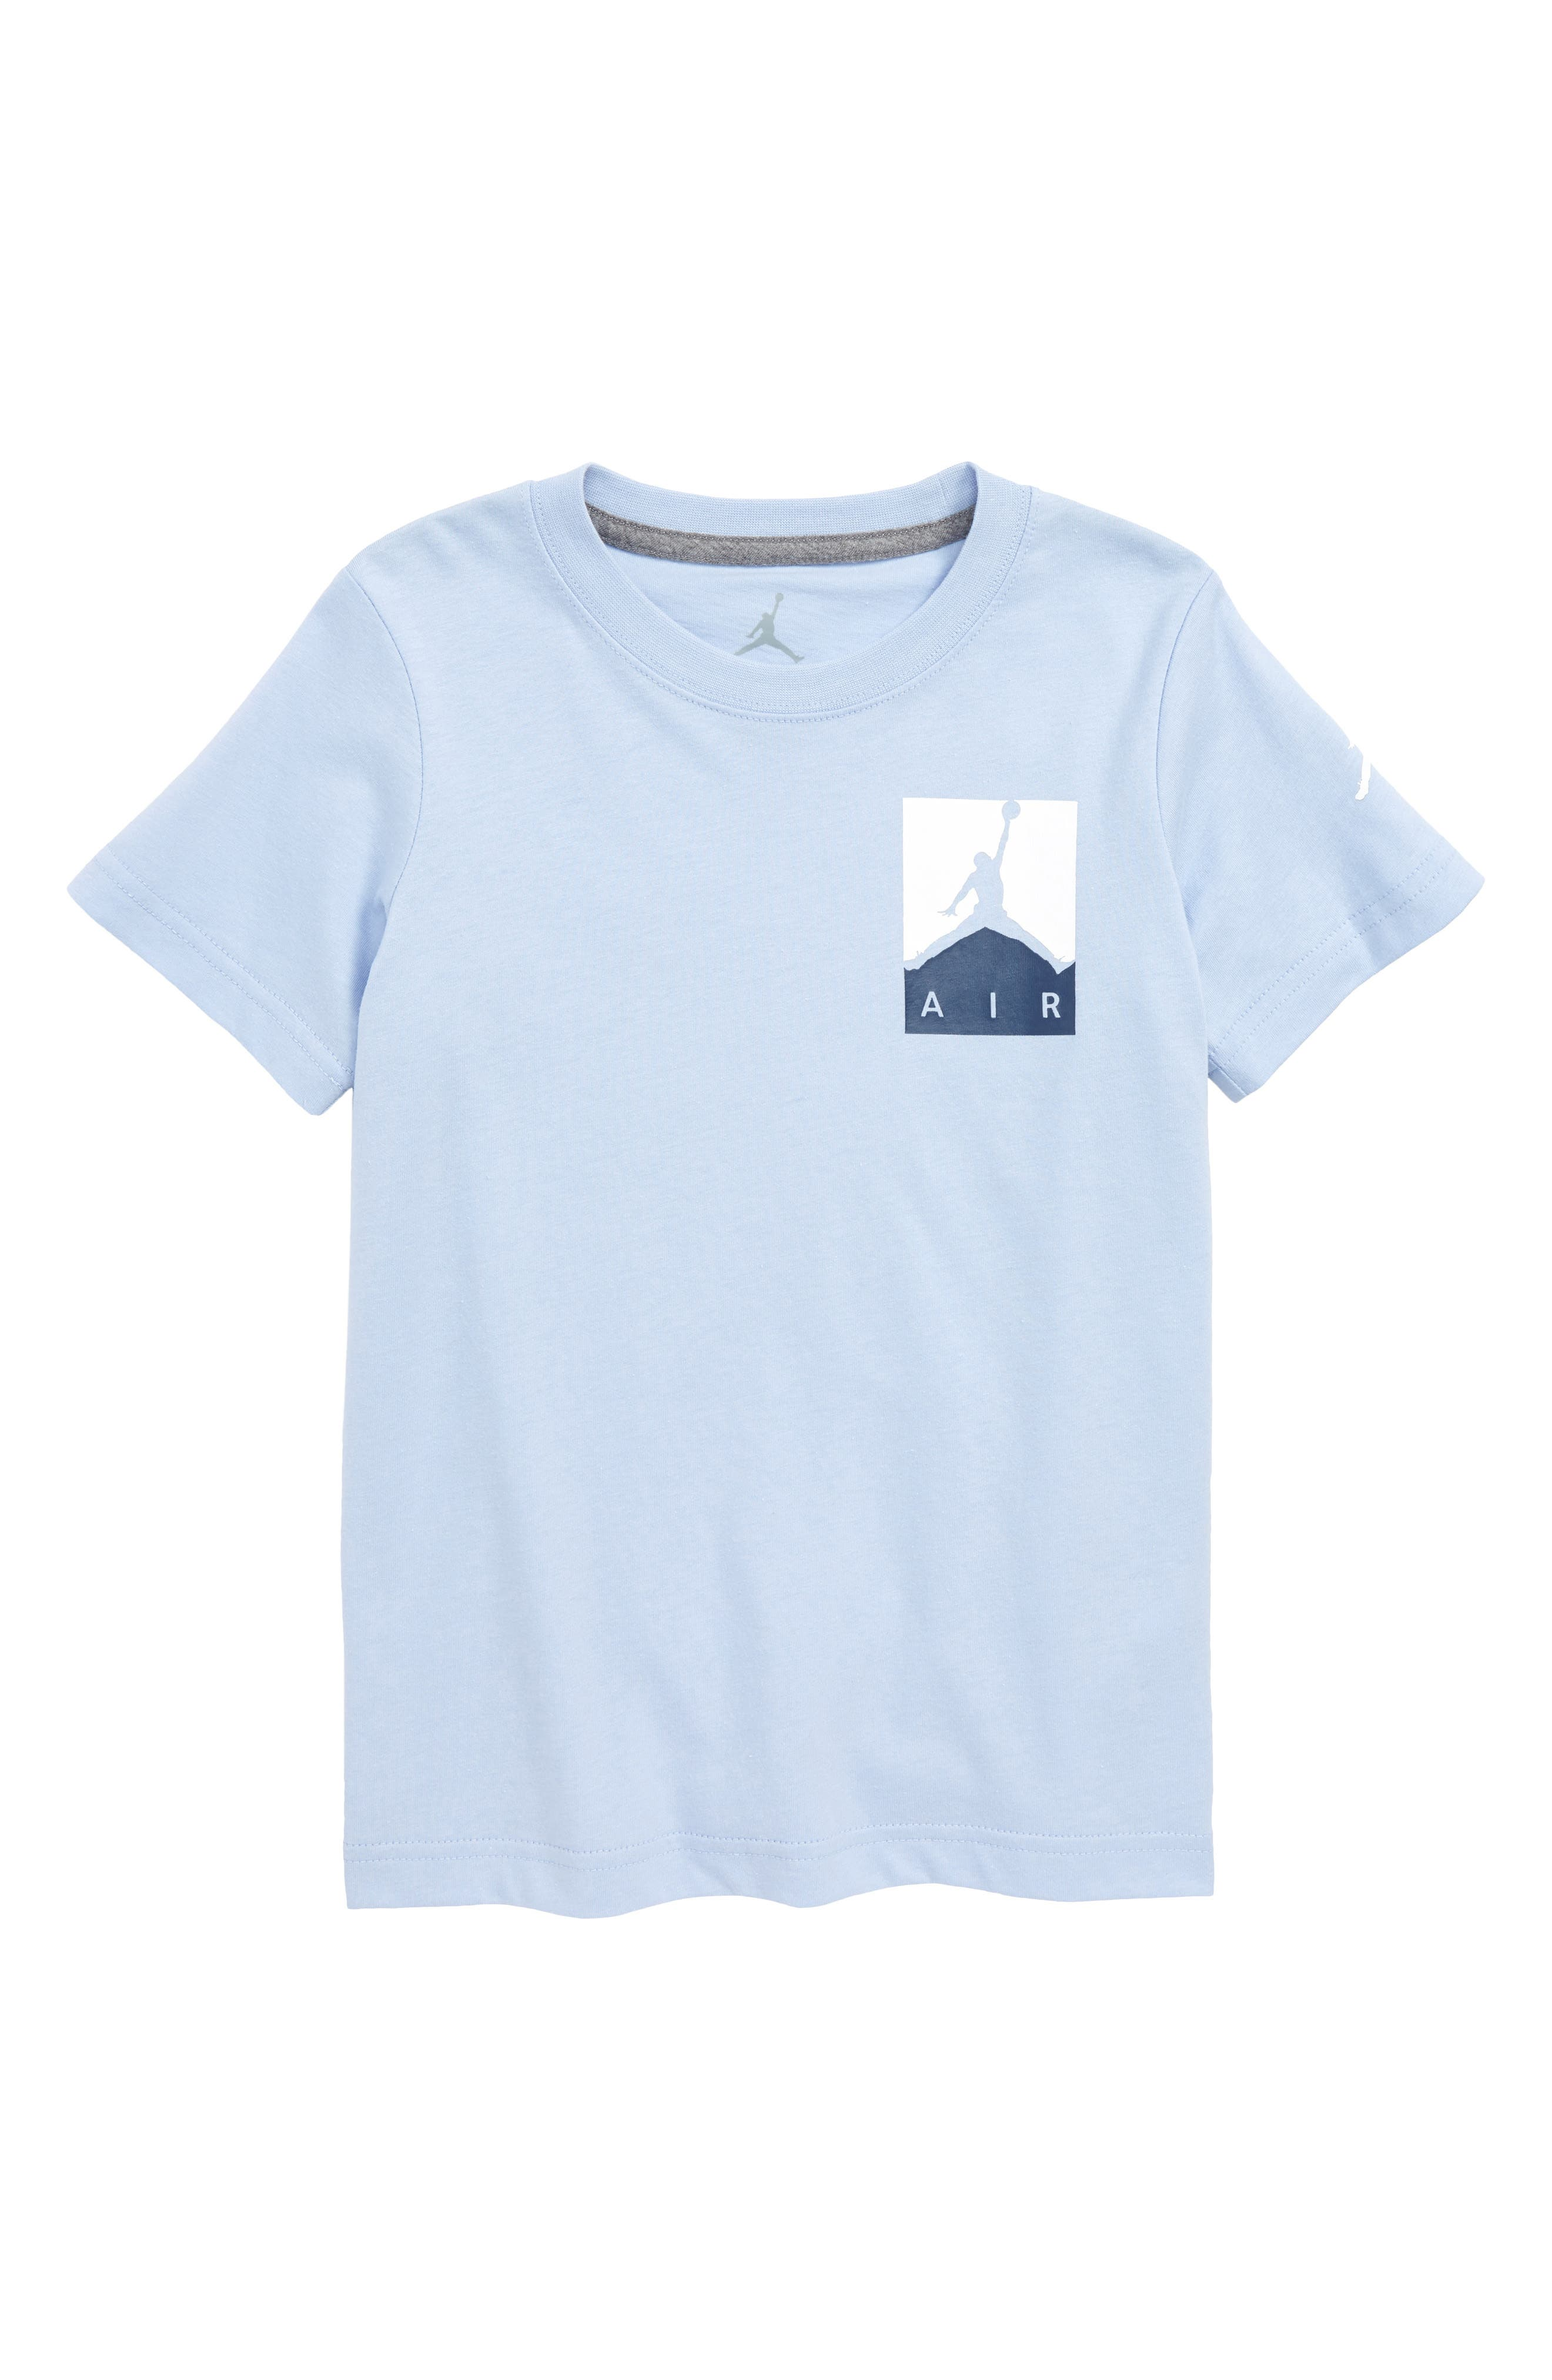 Nike Jordan Racked Up Graphic T-Shirt,                         Main,                         color, Cobalt Bliss